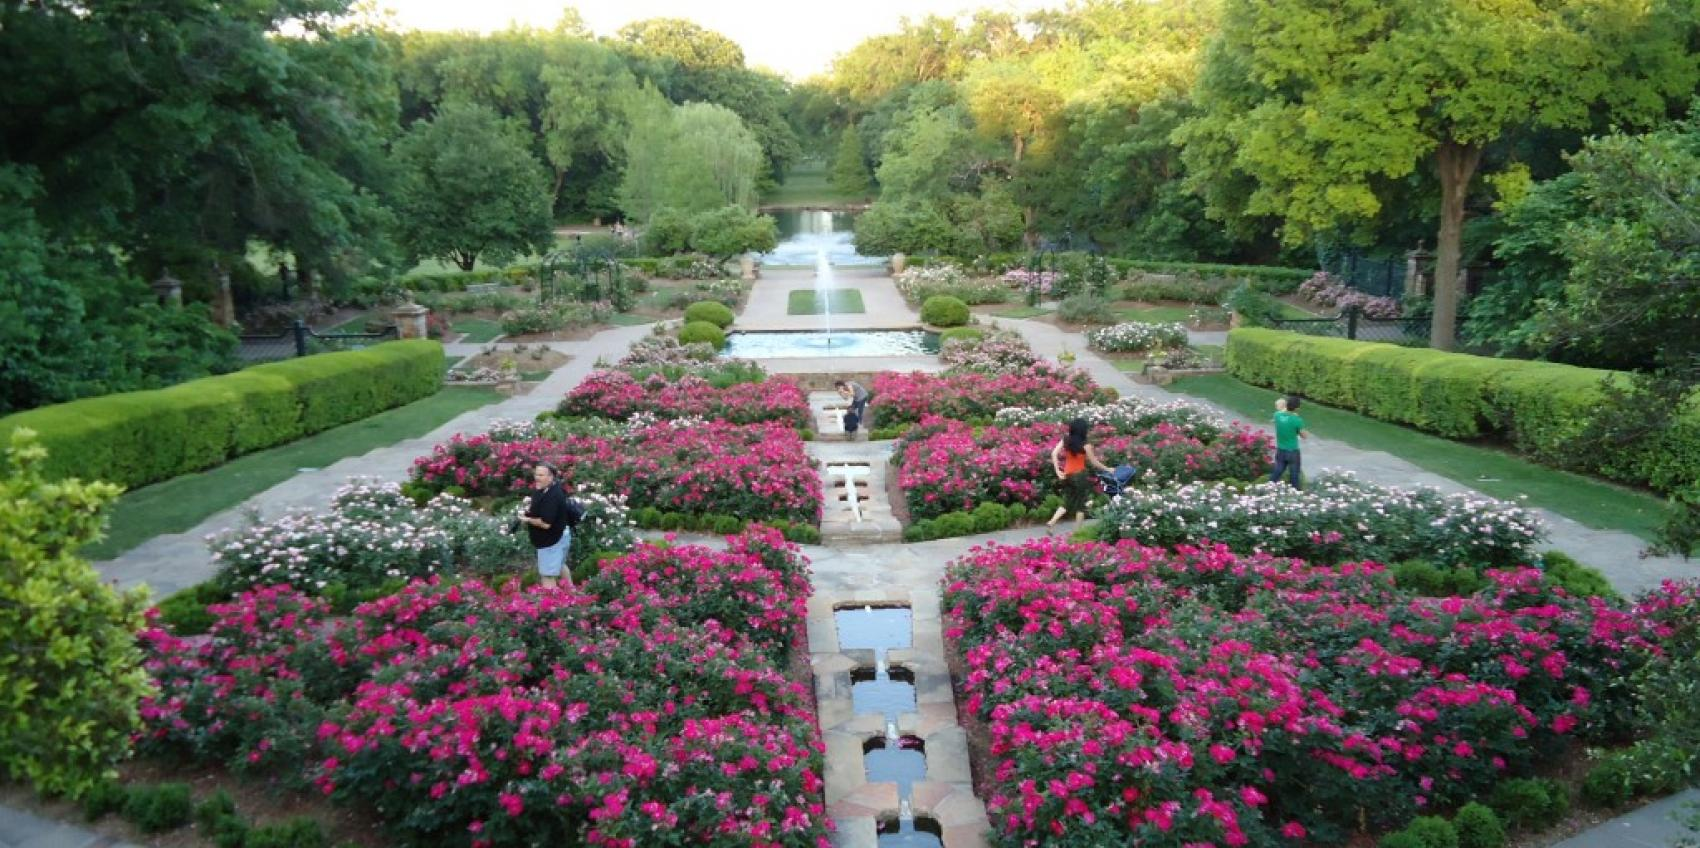 Fort Worth Botanic Garden American Public Gardens Association